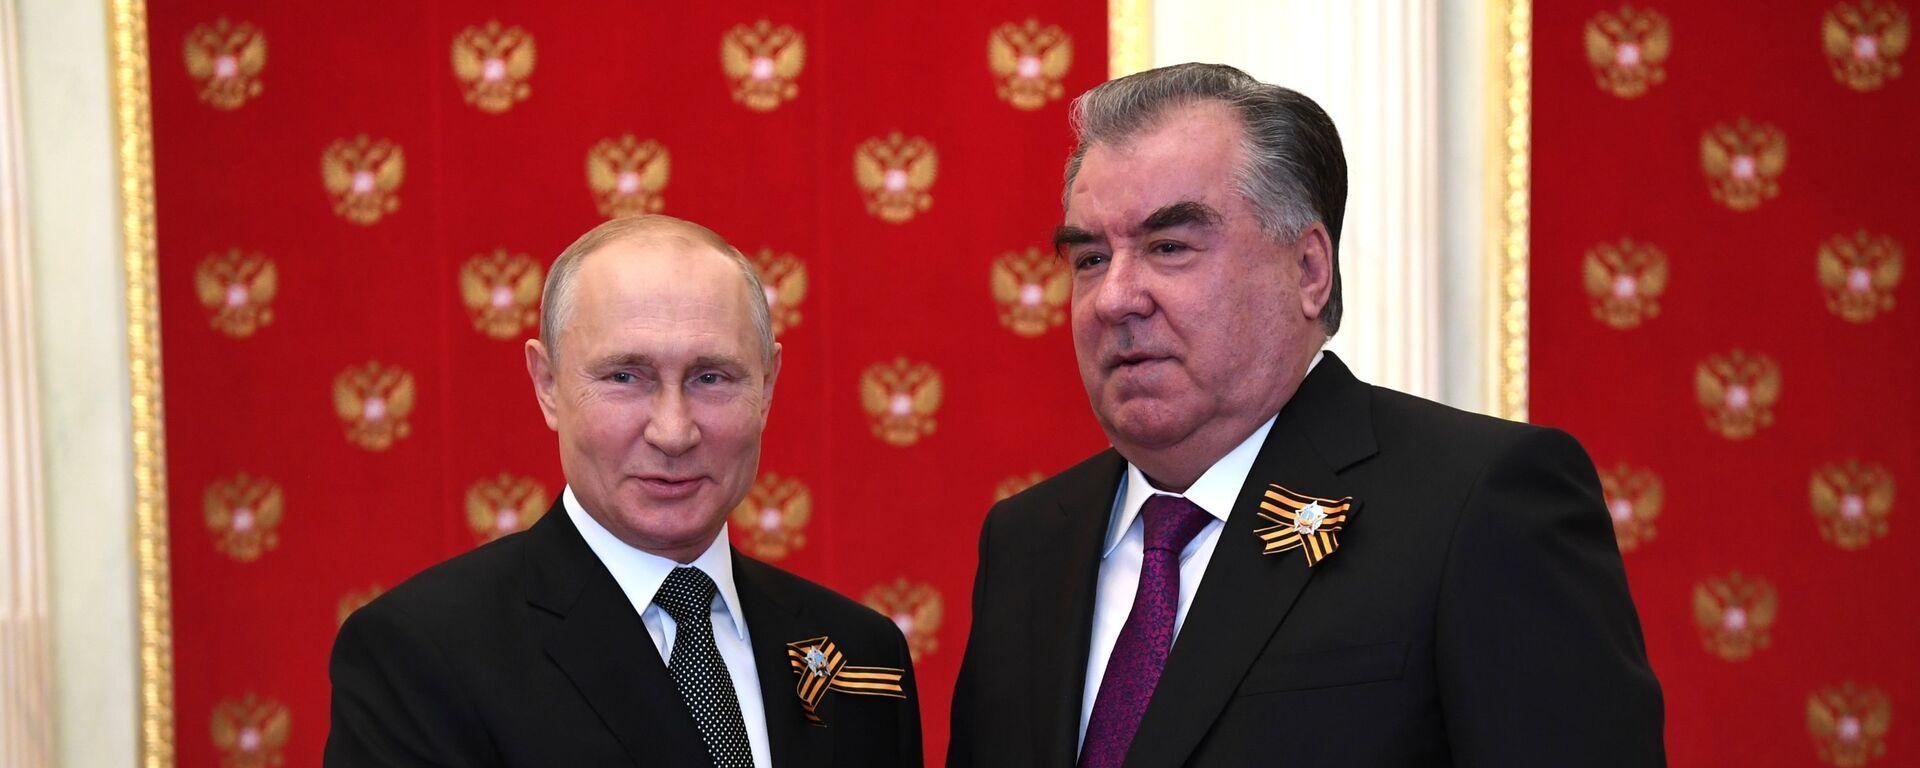 Президент РФ Владимир Путин и президент Таджикистана Эмомали Рахмон - Sputnik Таджикистан, 1920, 05.05.2021